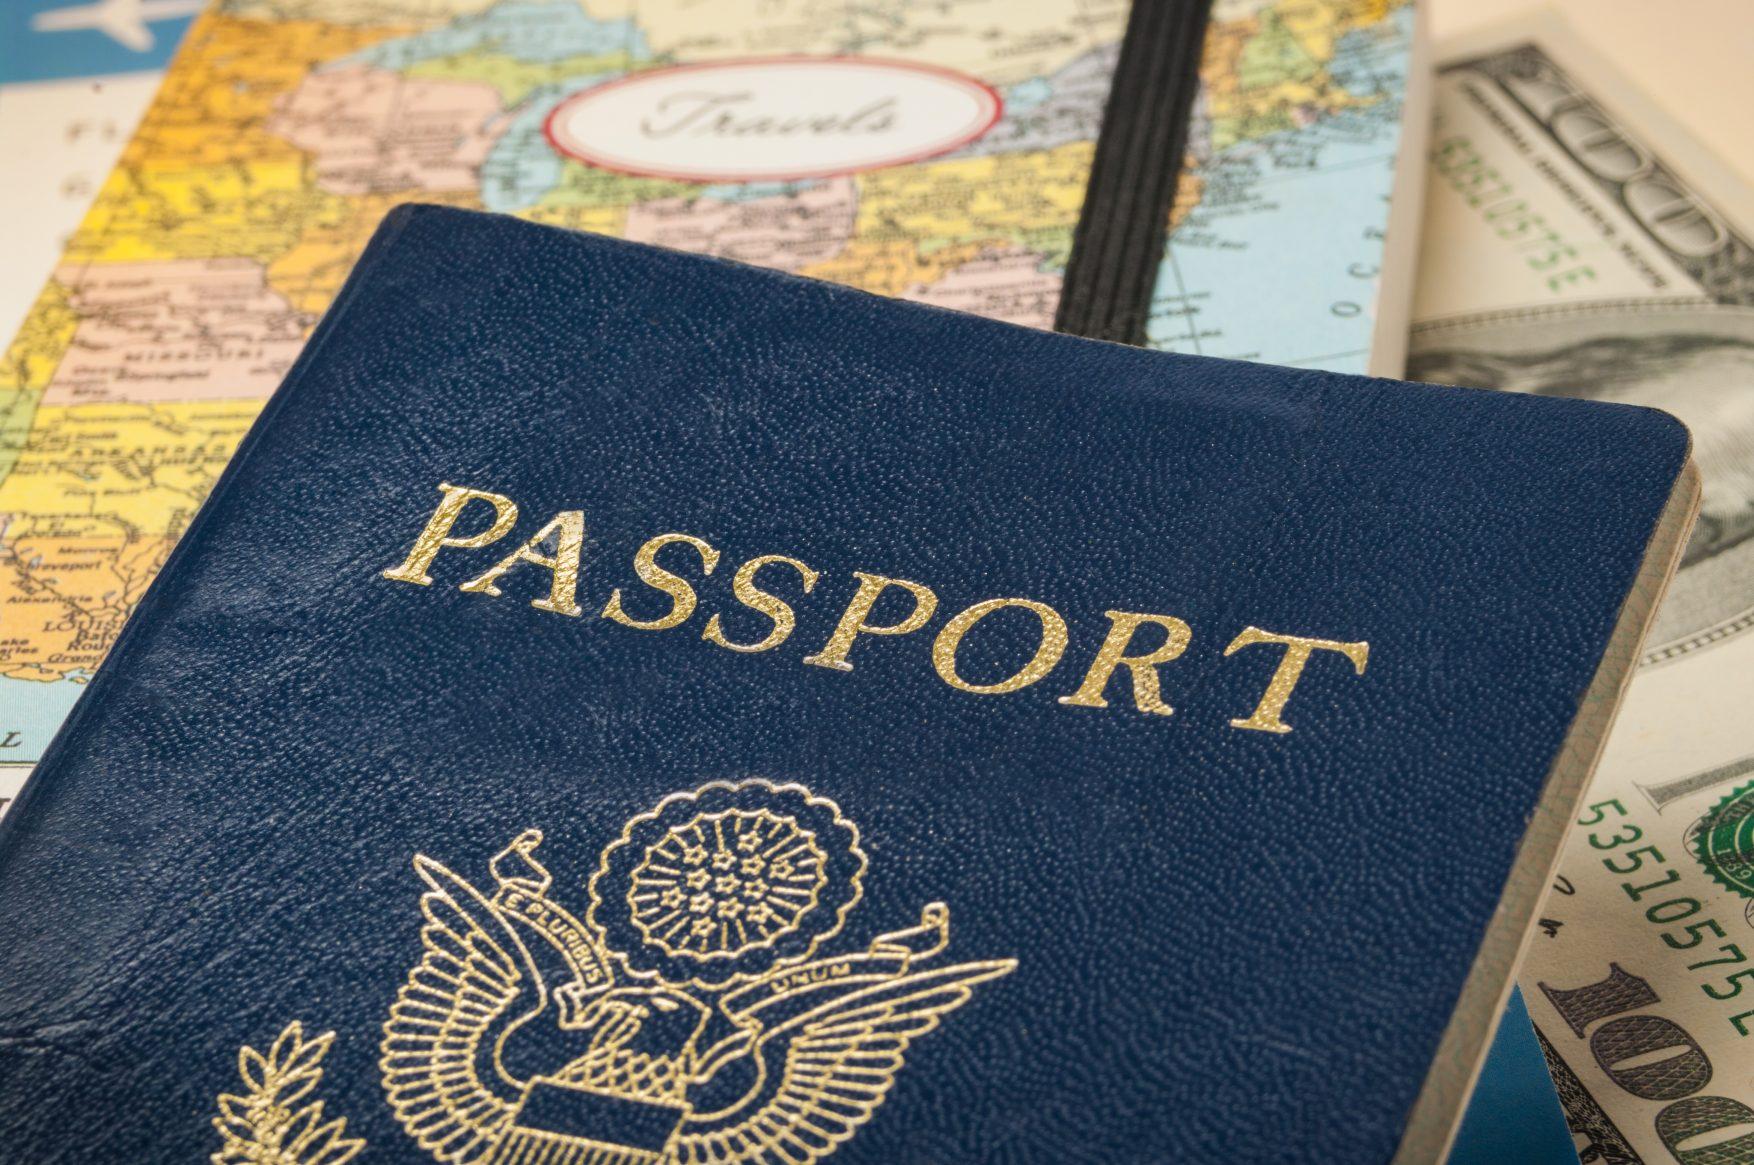 سرویس پاسپورت تلگرام چیست و چگونه کار میکند؟